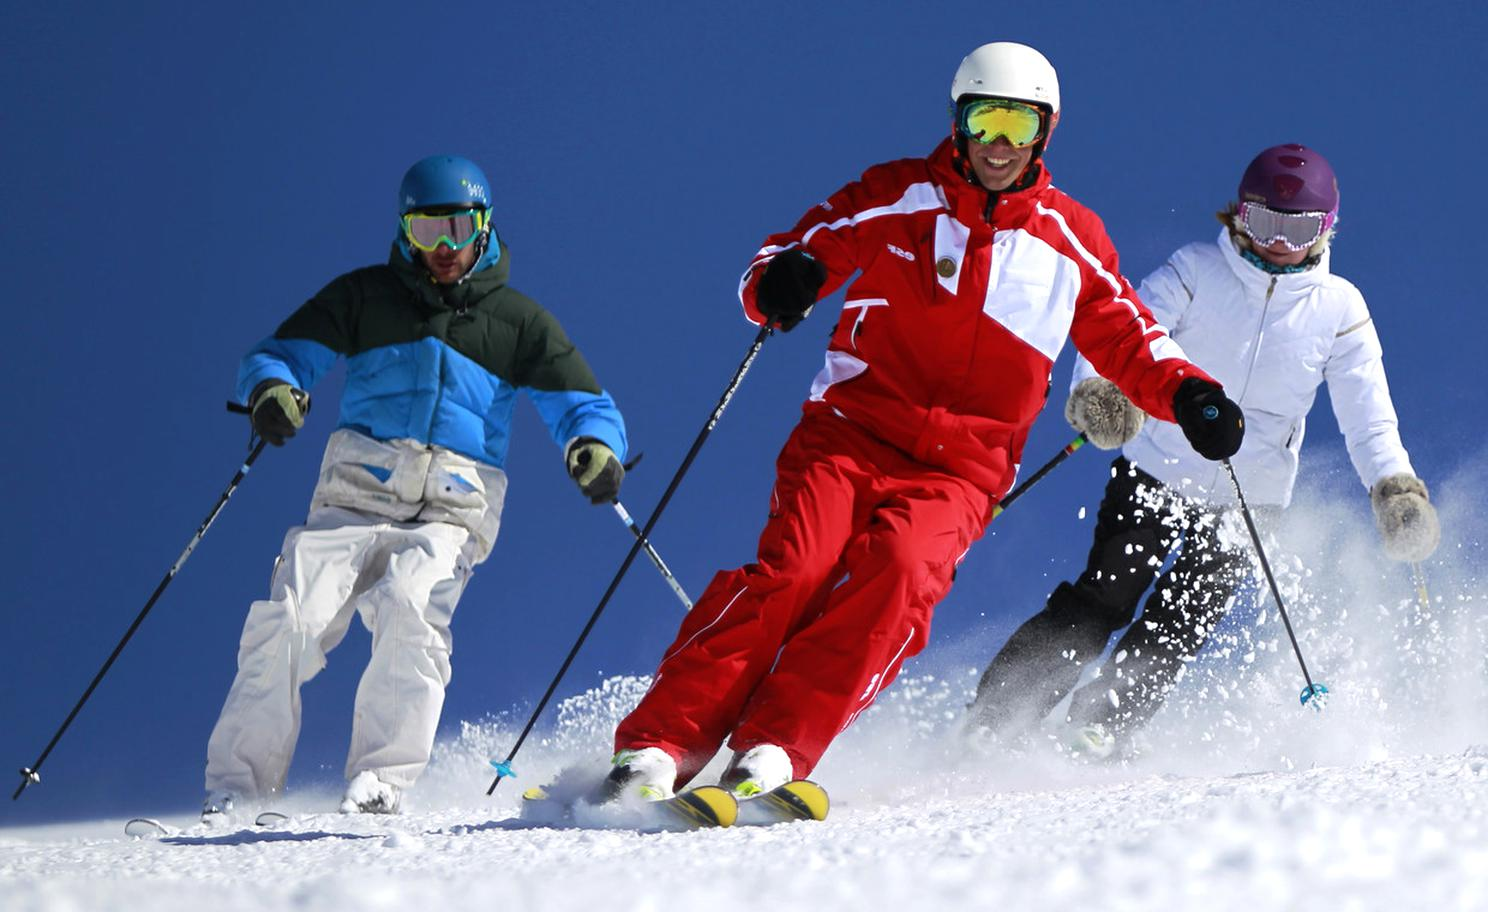 moniteur ski esf d'occasion